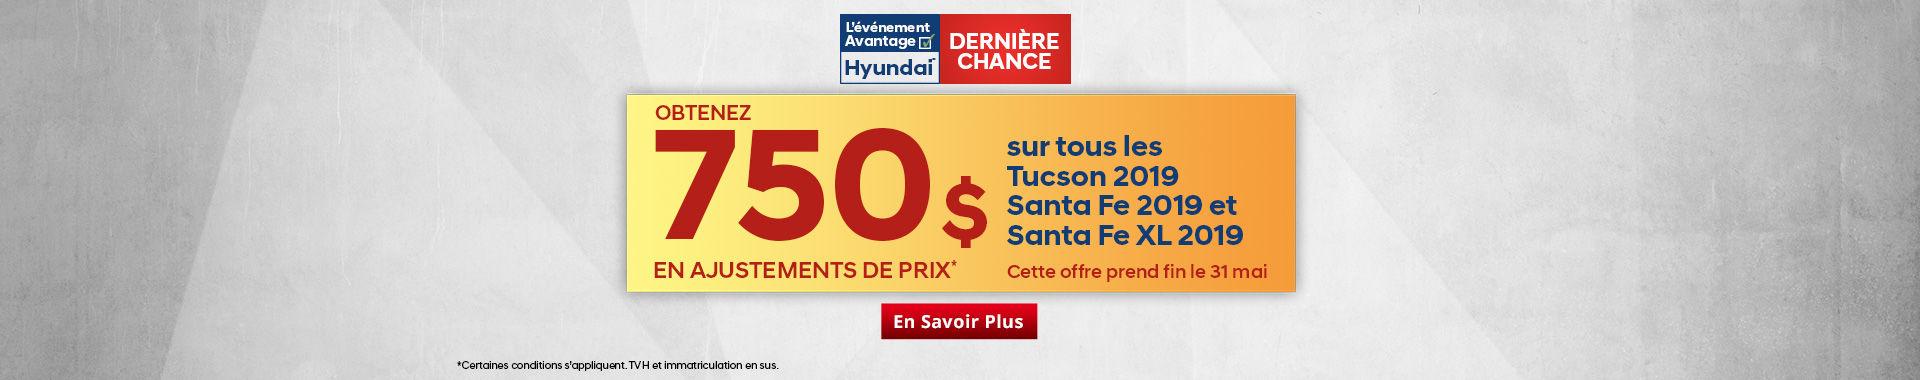 Événement Hyundai